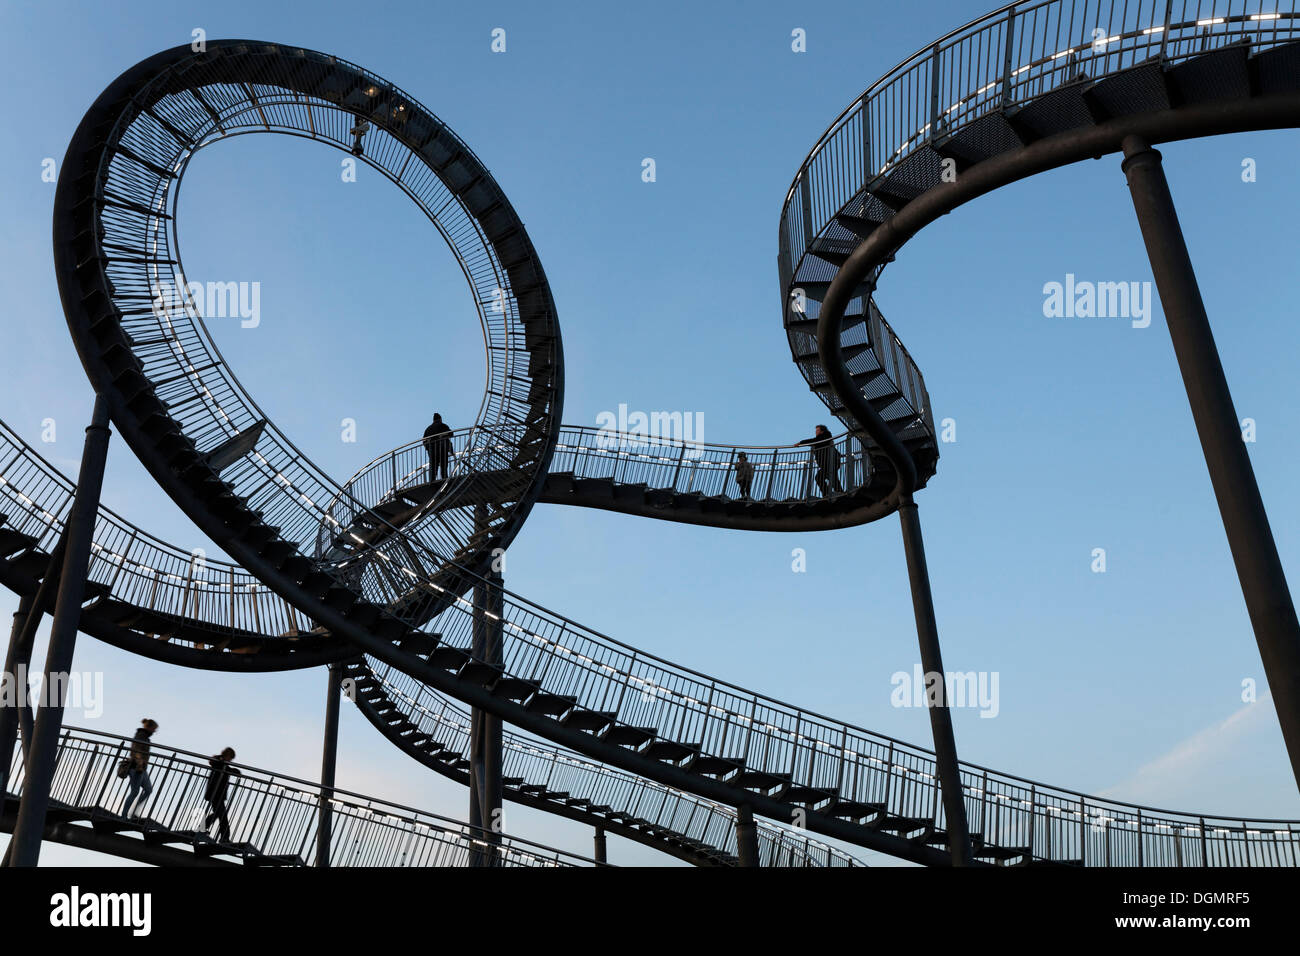 Tiger & Turtle - Magic Mountain, landmark, accessible sculpture shaped like a roller coaster, Angerpark, Angerhausen, Stock Photo